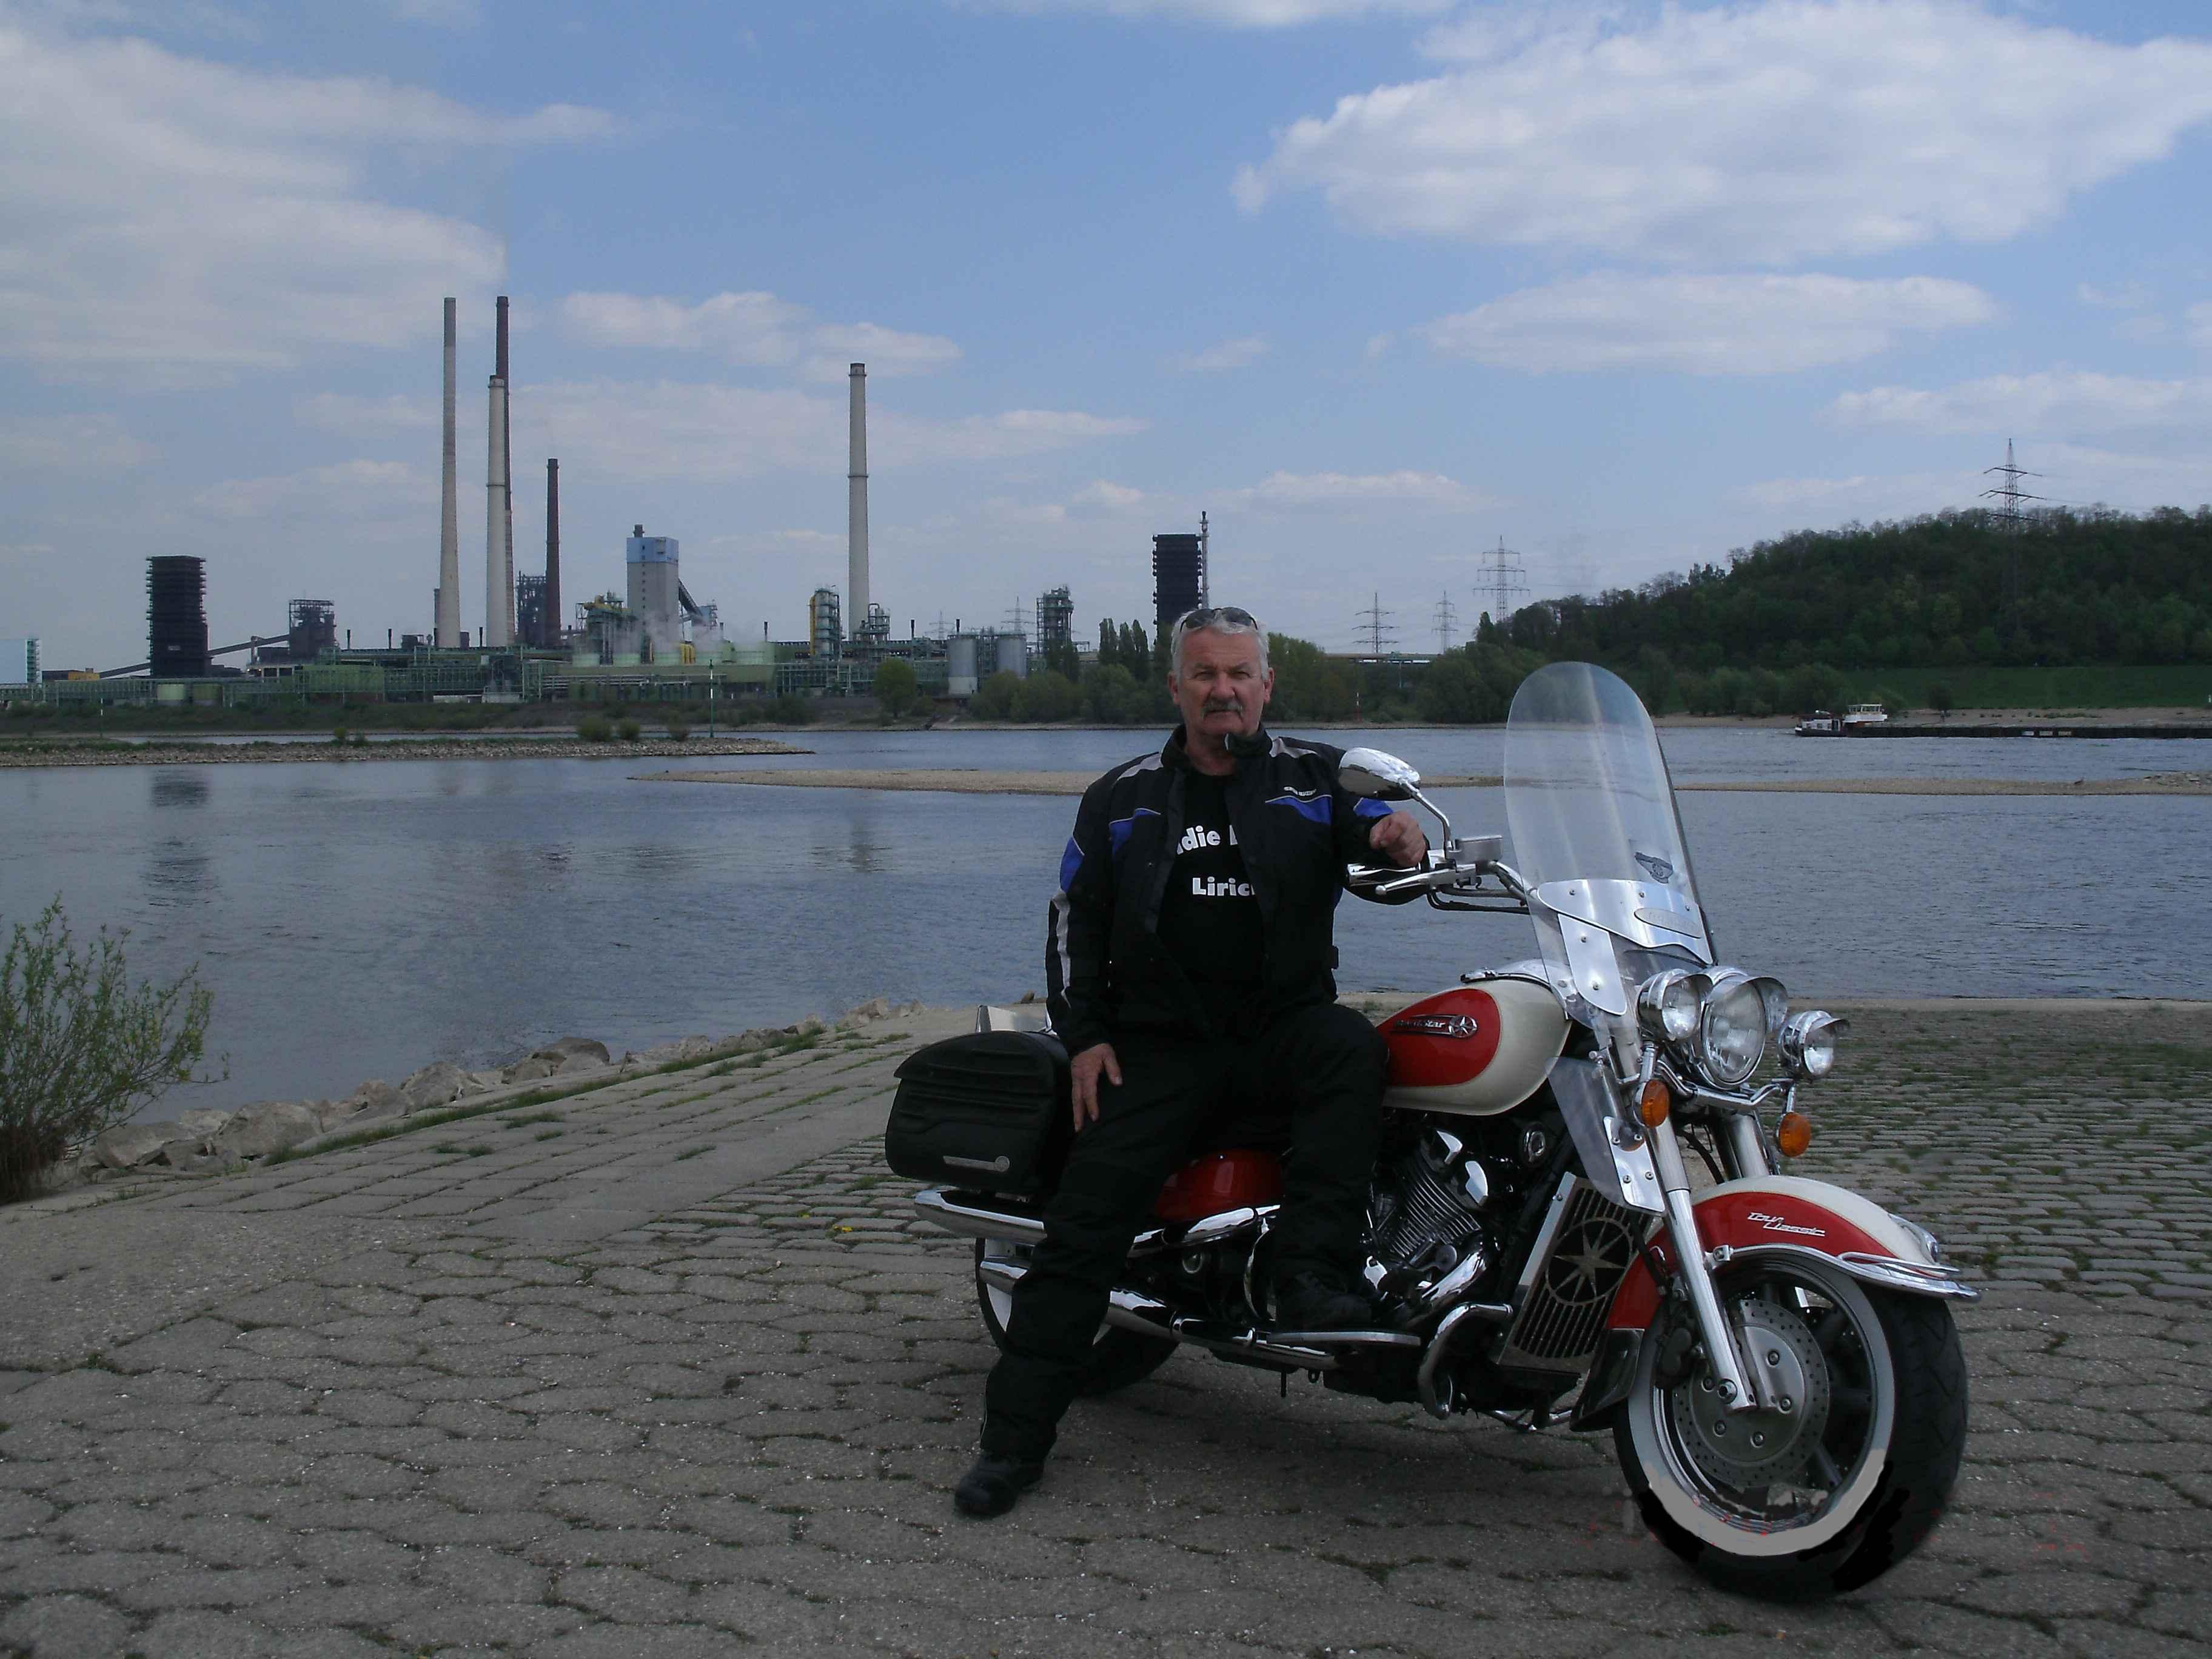 memorian hans-peter laskowski